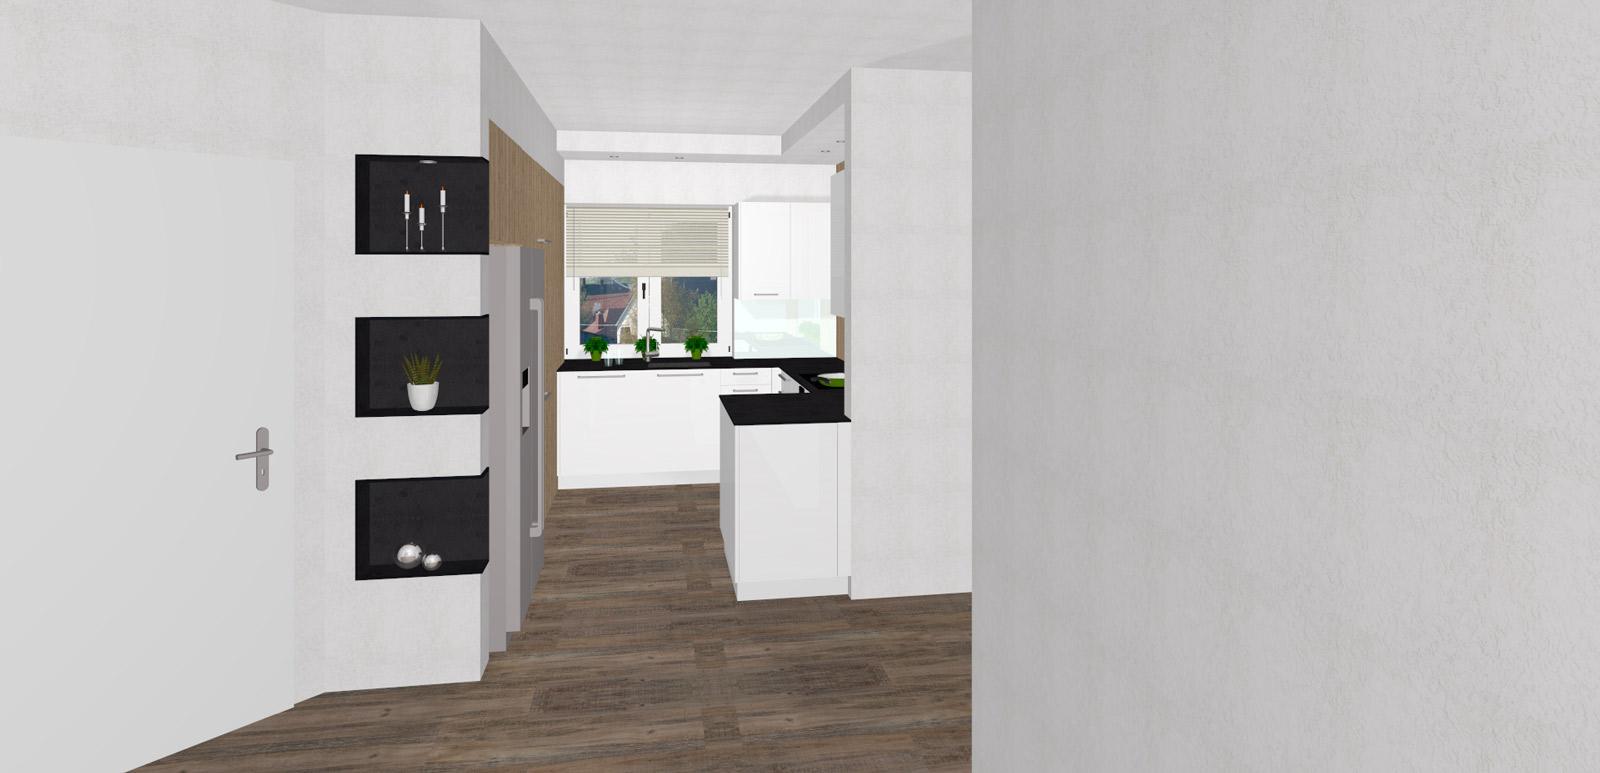 kompakte k che mit versteckter speist r und integriertem ami k hlschrank in bad zell. Black Bedroom Furniture Sets. Home Design Ideas